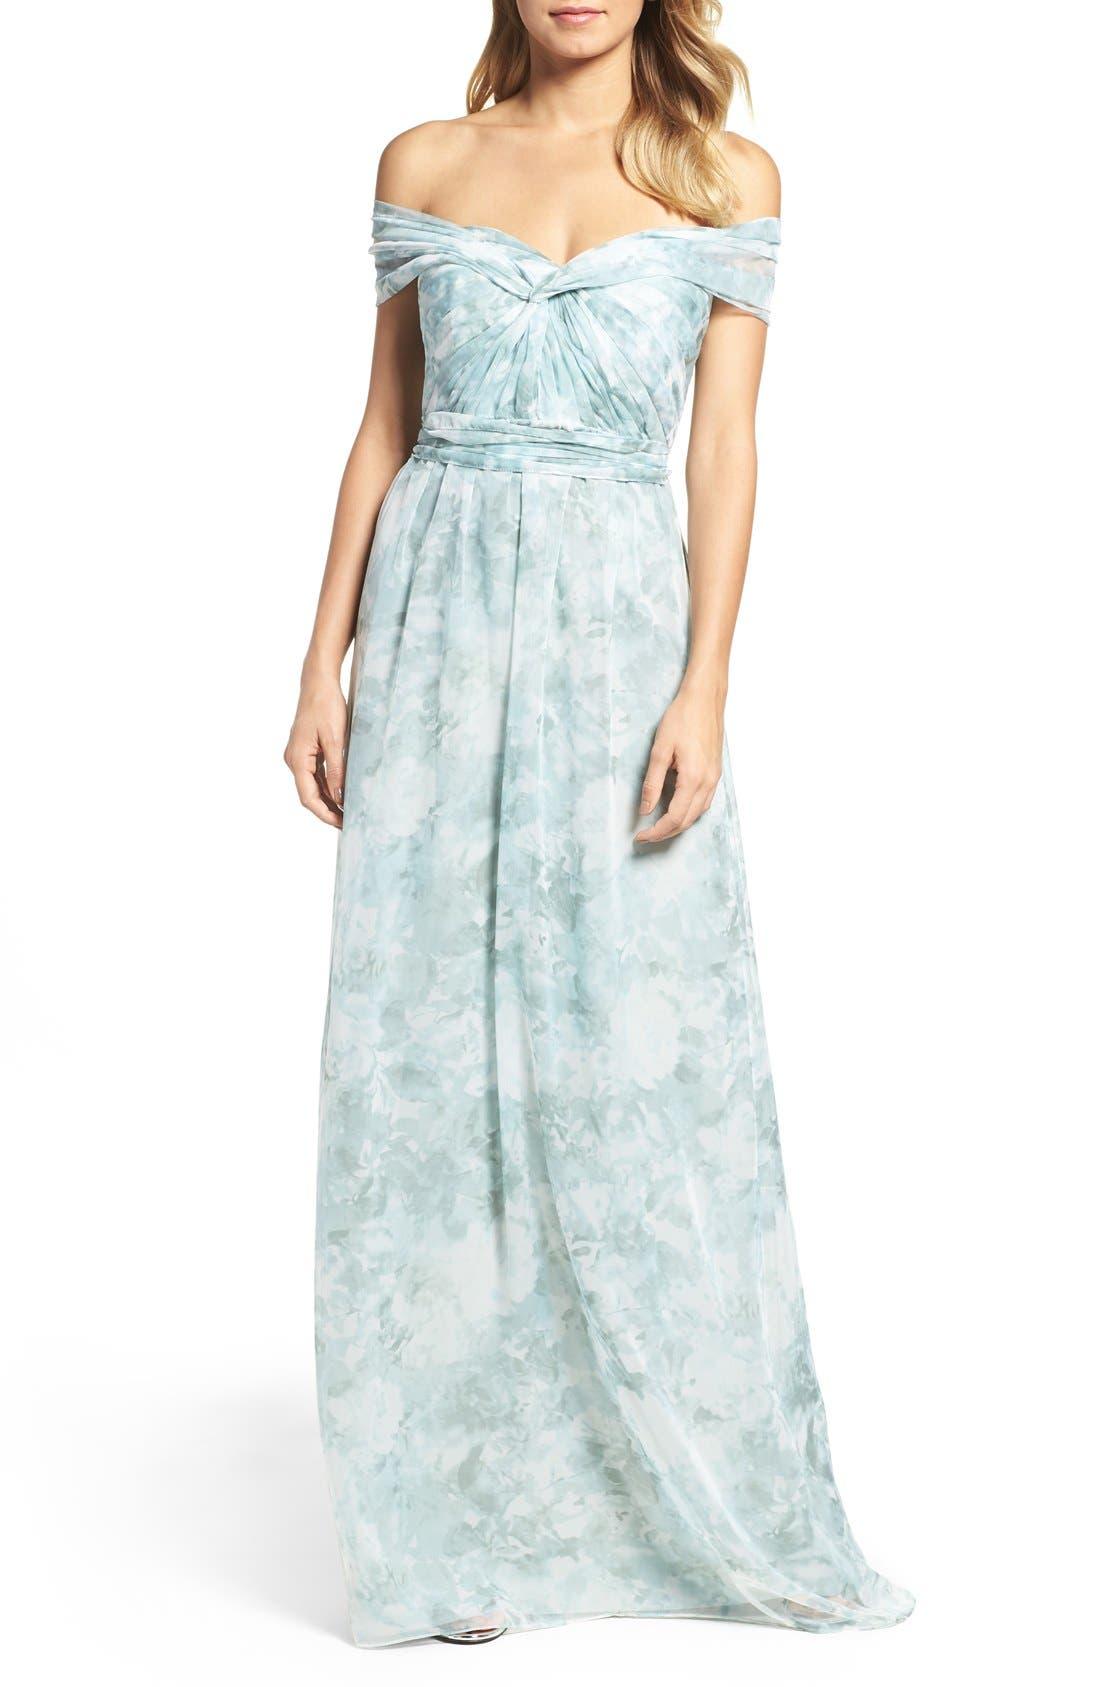 Main Image - Jenny Yoo 'Nyla' Floral Print Convertible Strapless Chiffon Gown